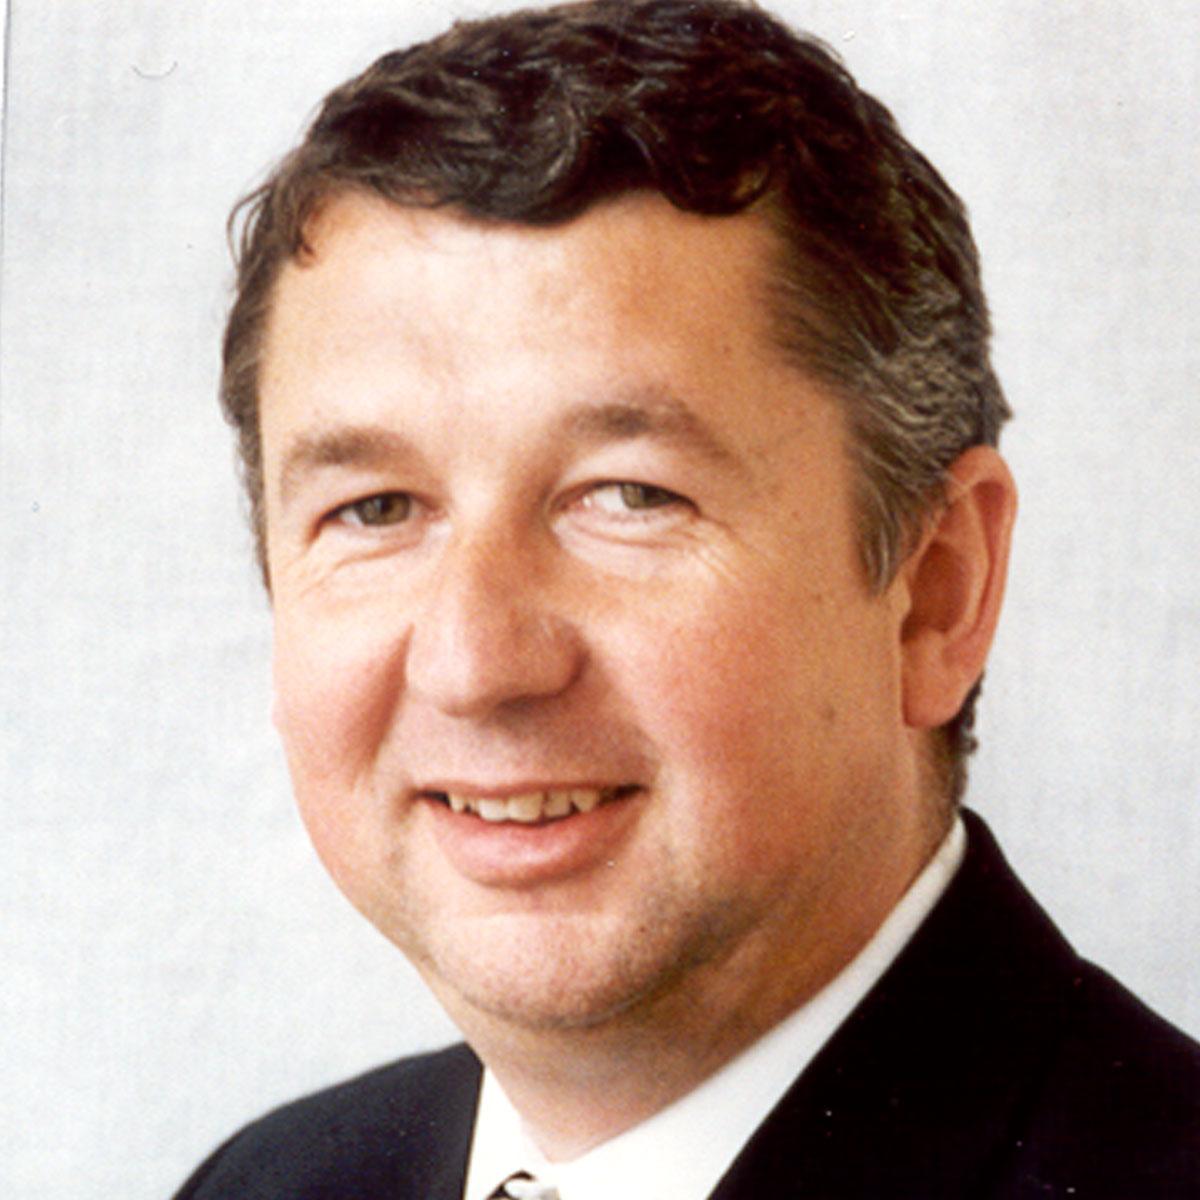 Paul Sitkowski